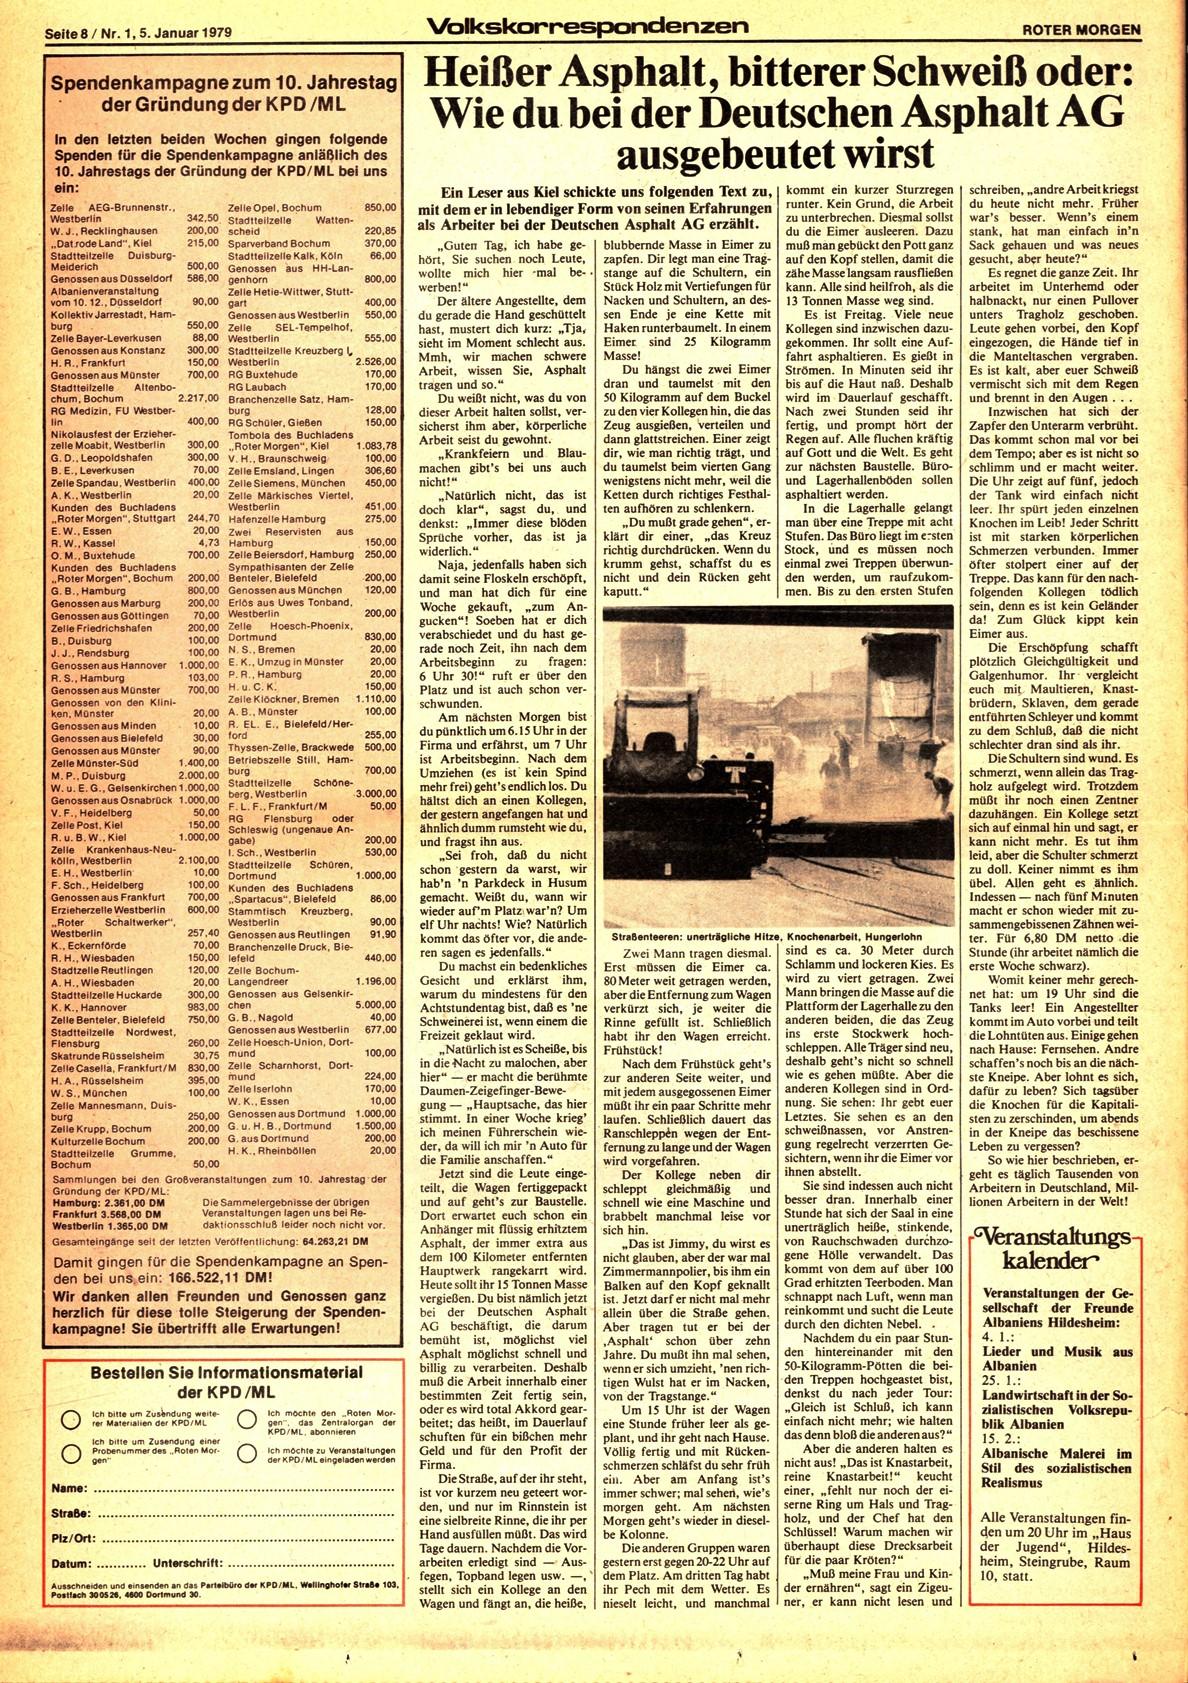 Roter Morgen, 13. Jg., 5. Januar 1979, Nr. 1, Seite 8